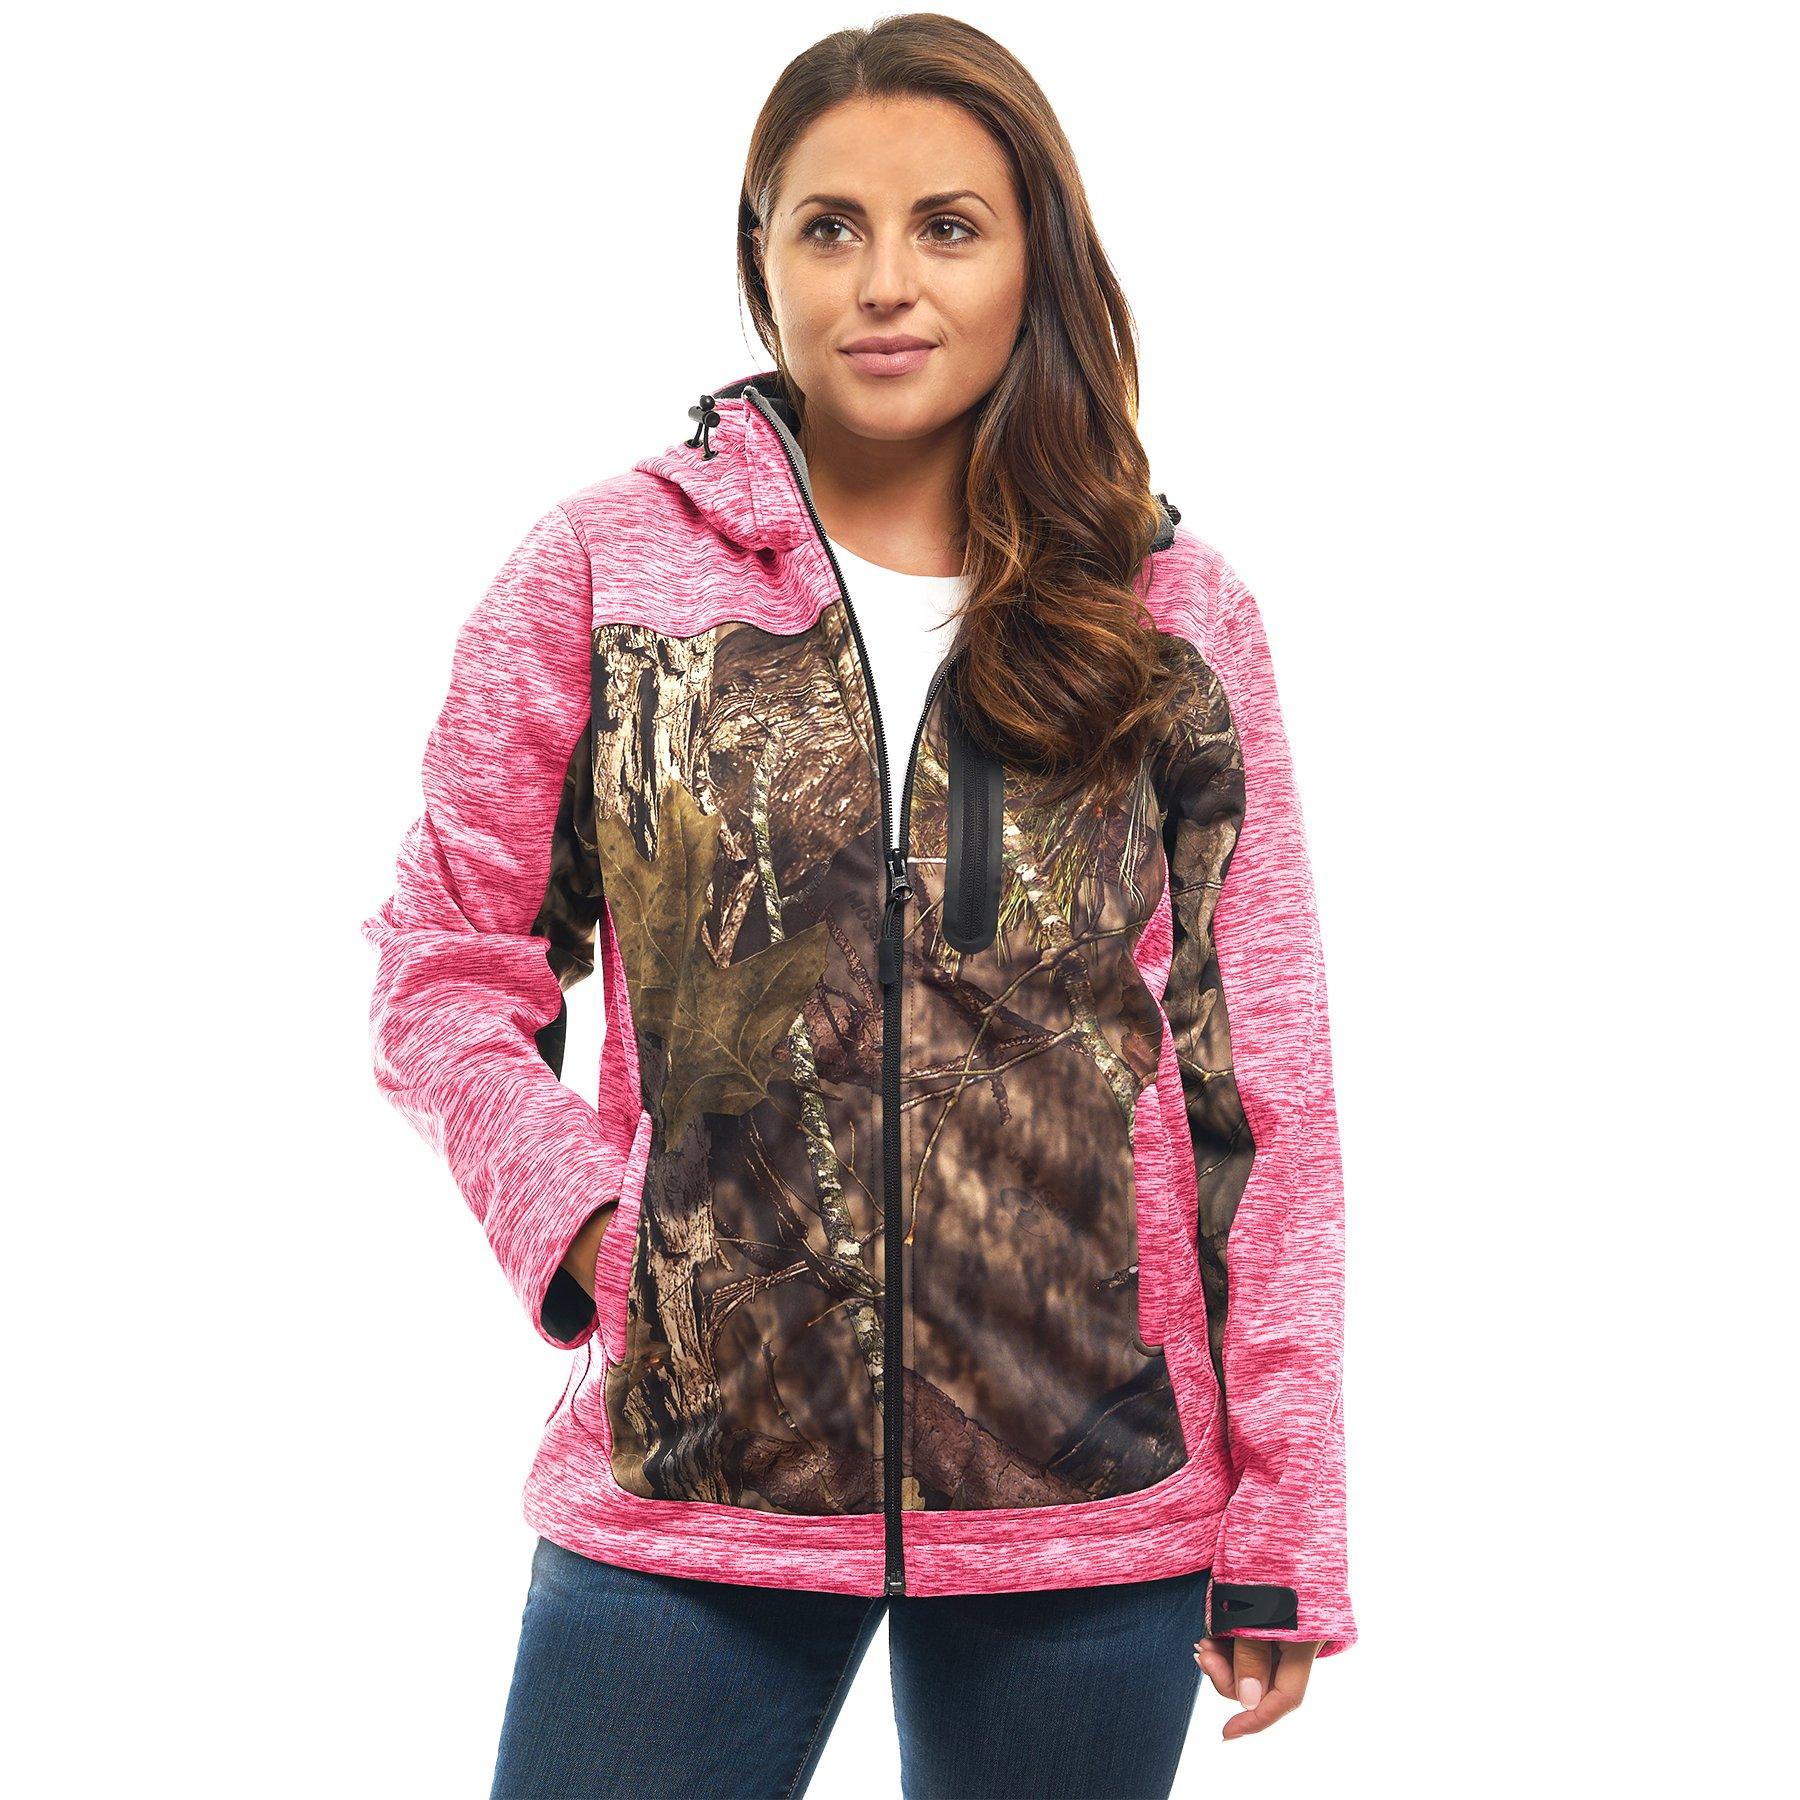 TrailCrest Women's Elite Full Zip Softshell Jacket Mossy Oak Camo Patterns (Pink Heather - Small)